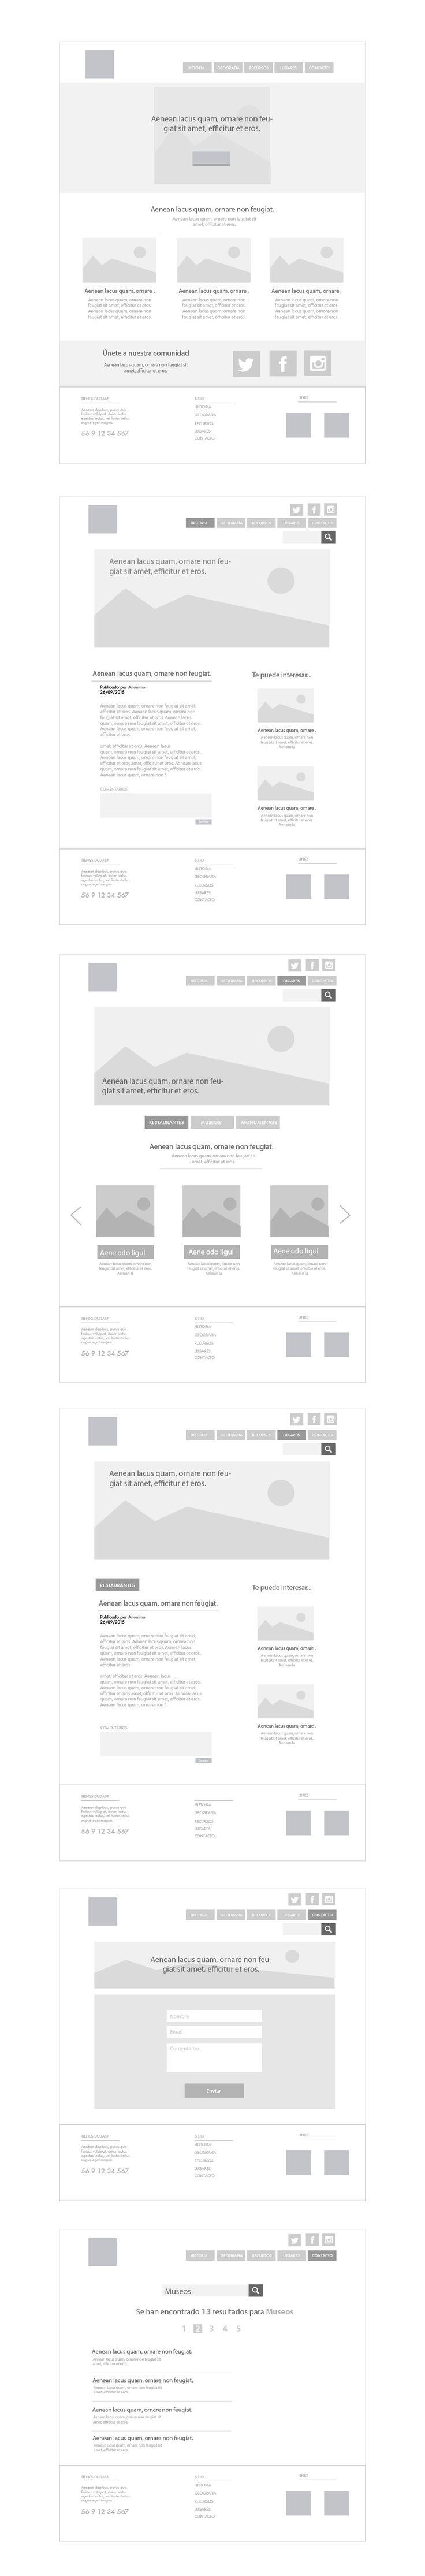 Wireframe Website - Illustrator